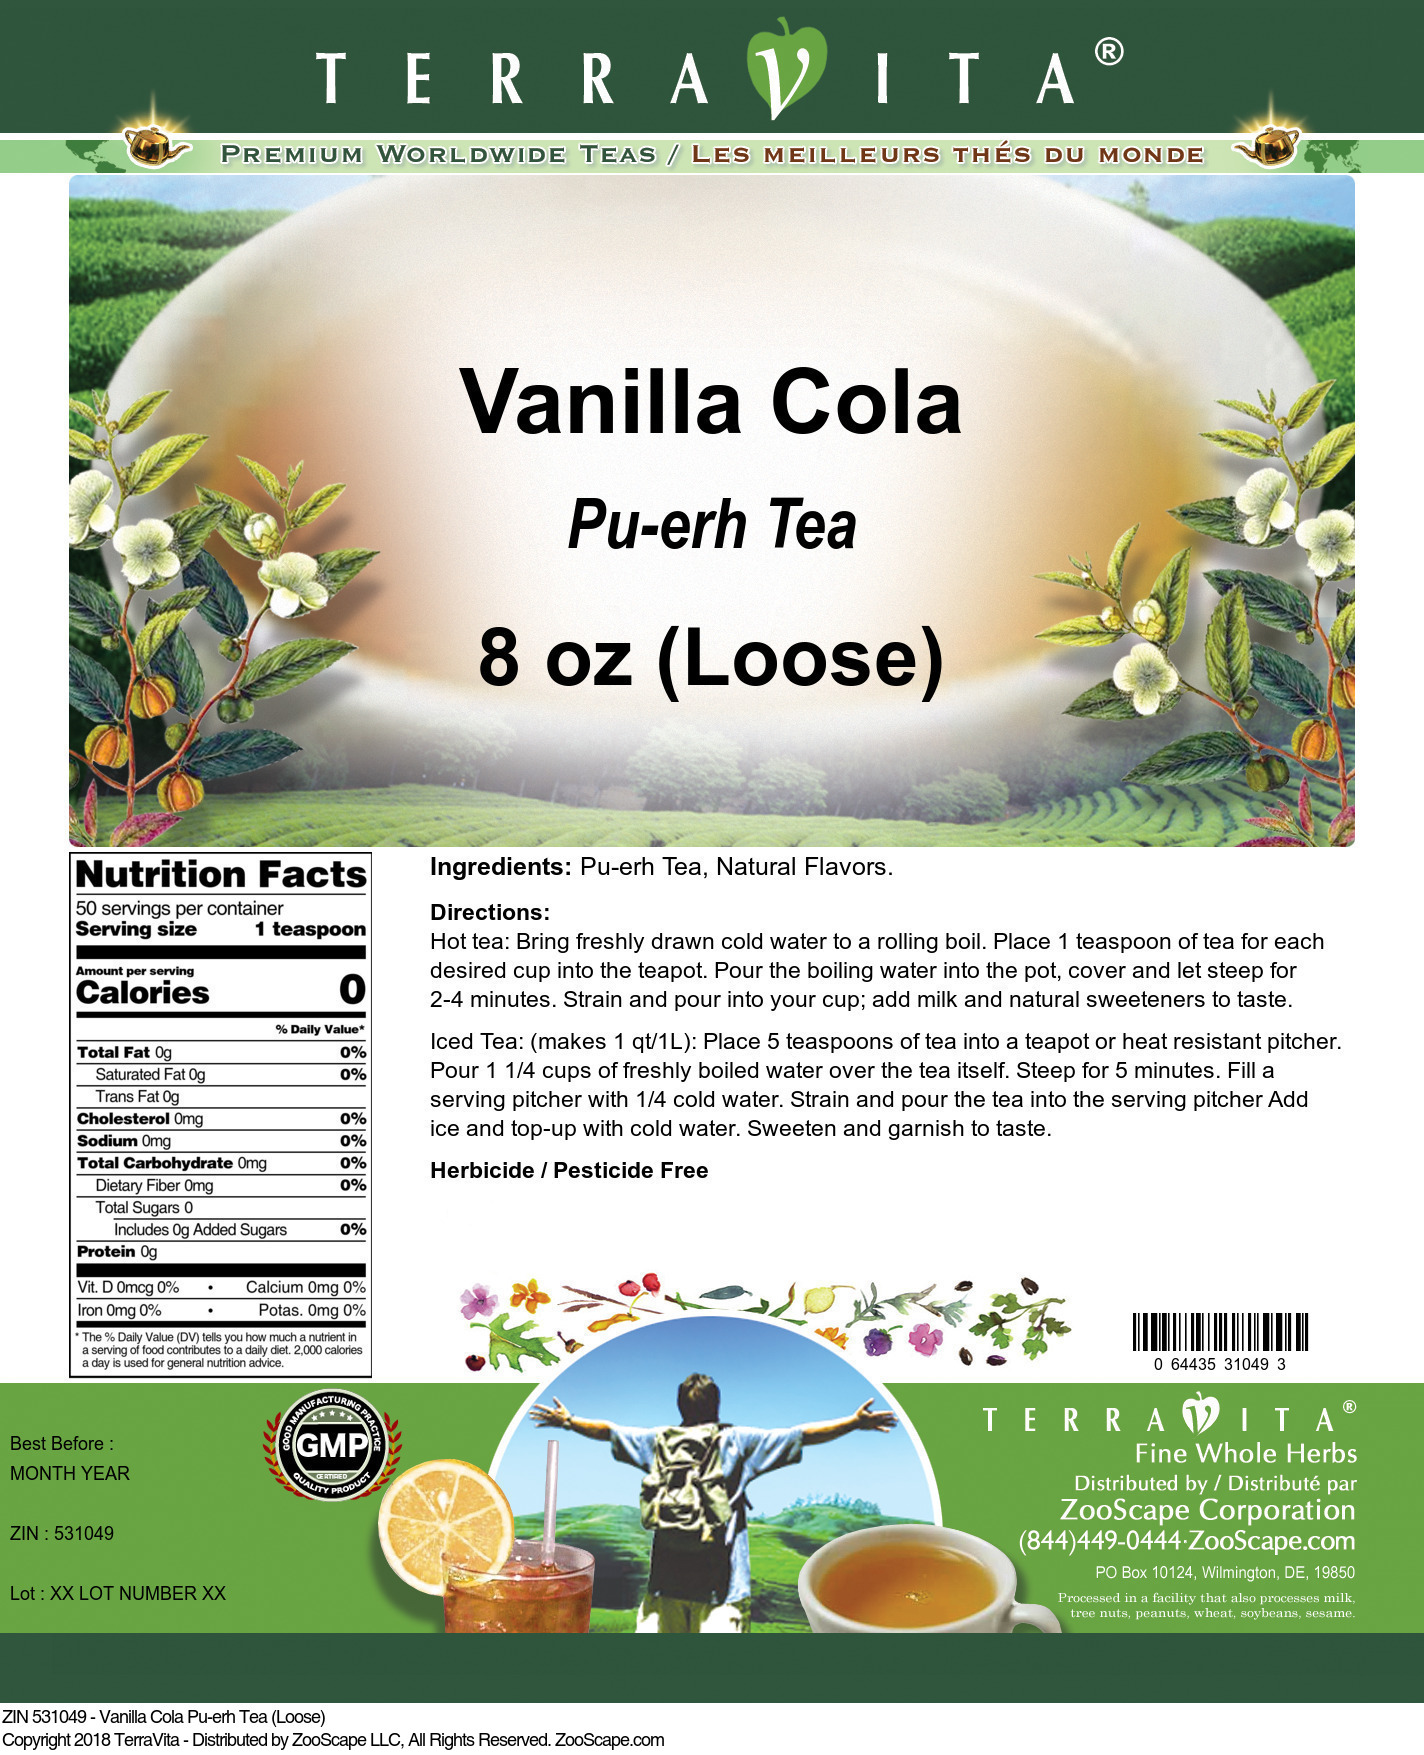 Vanilla Cola Pu-erh Tea (Loose)